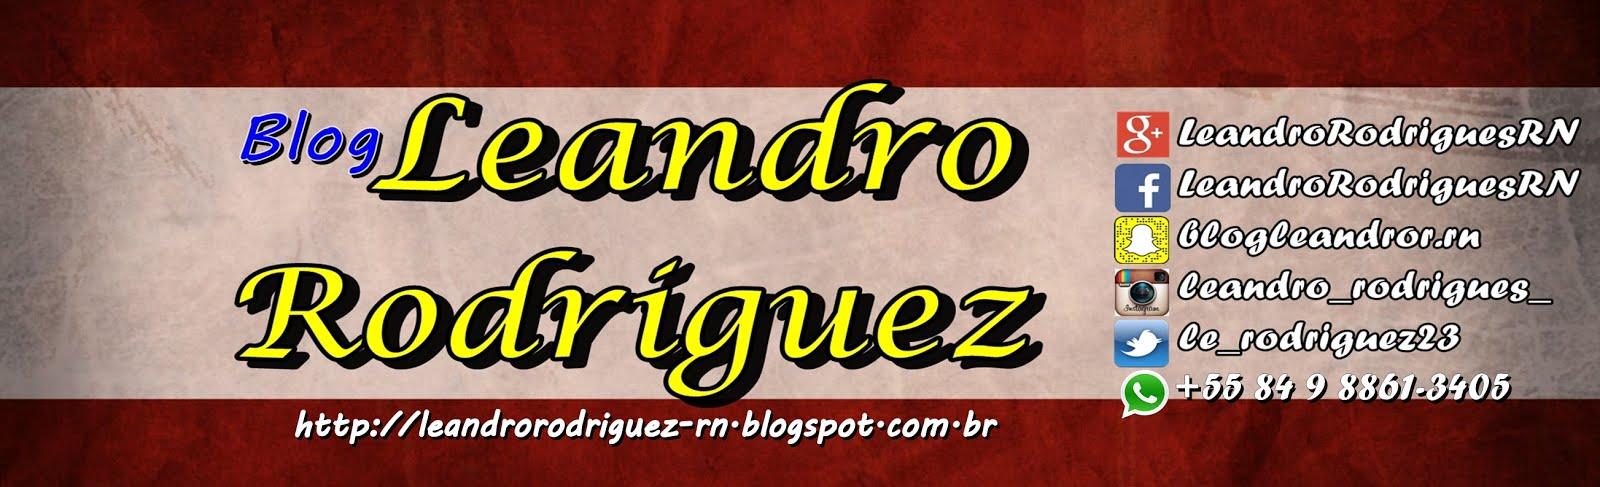 Blog Leandro Rodriguez-RN